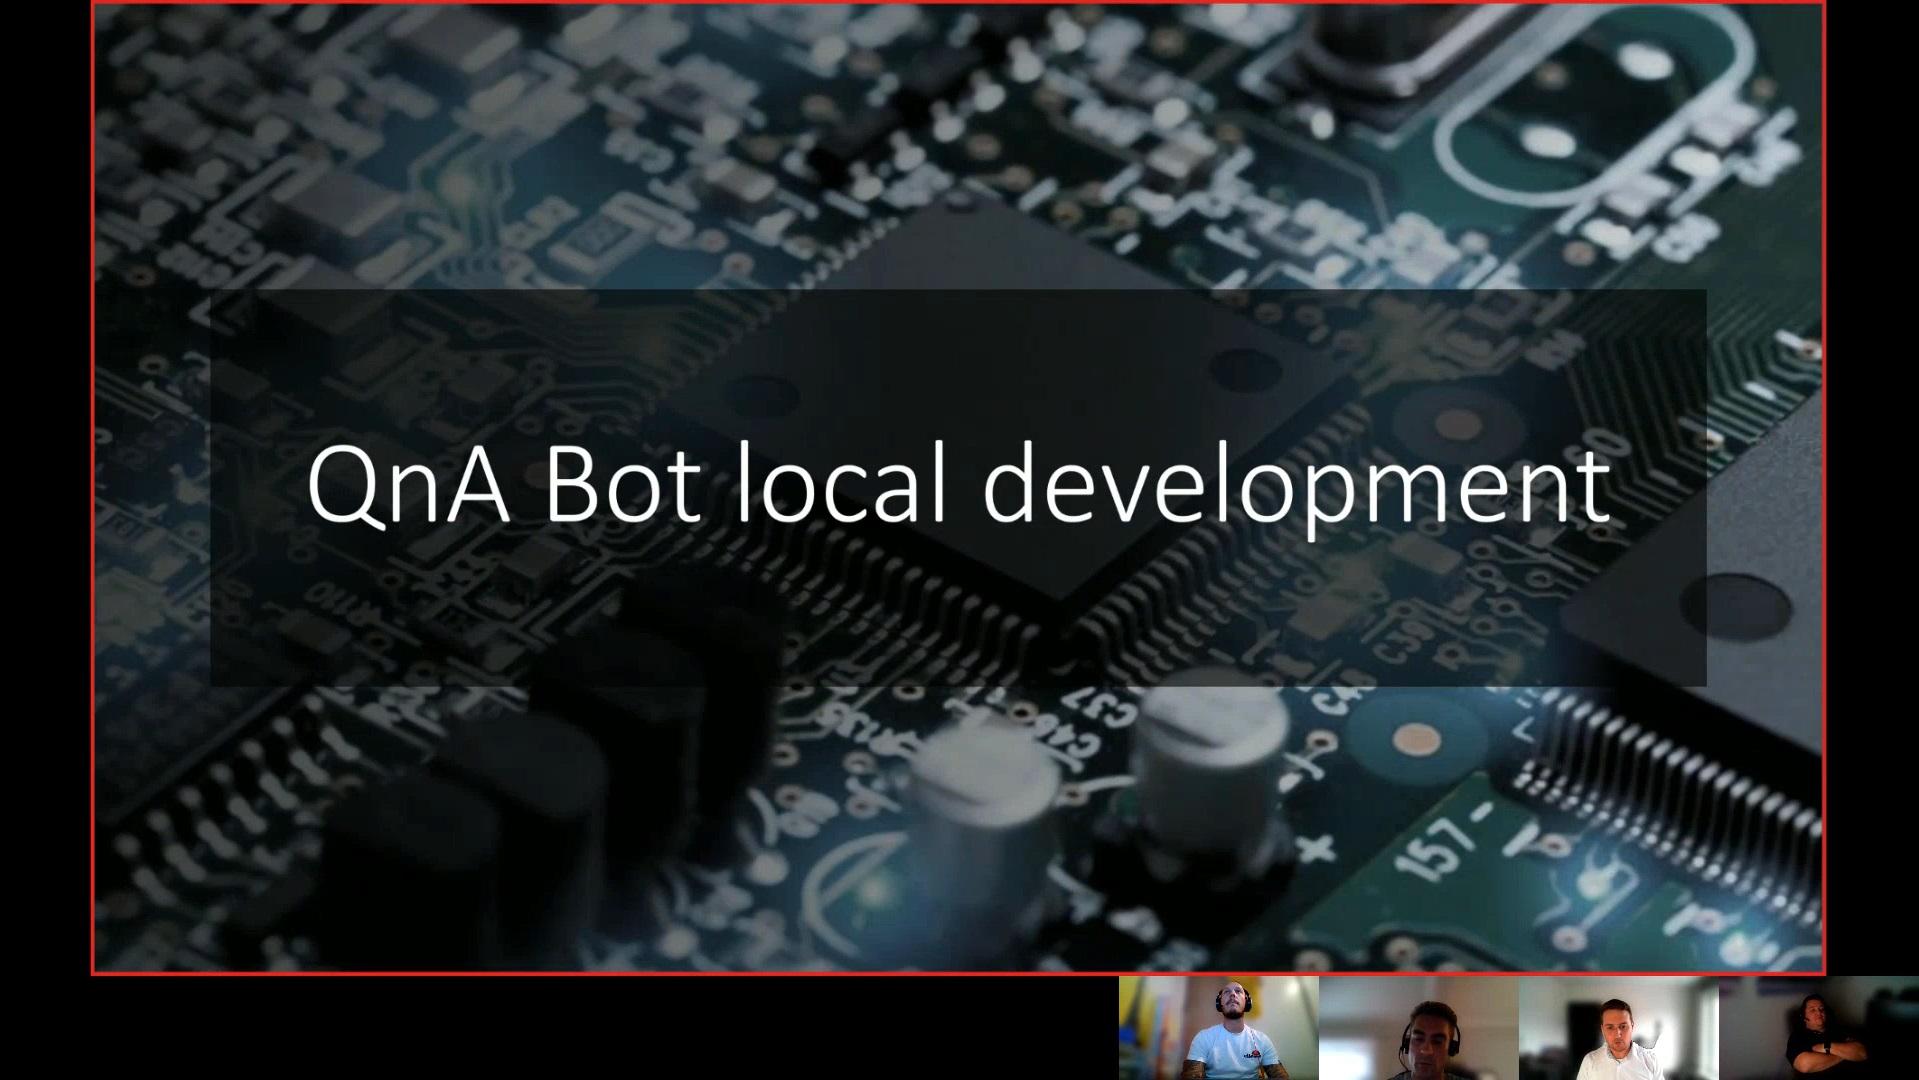 QnA bot local development